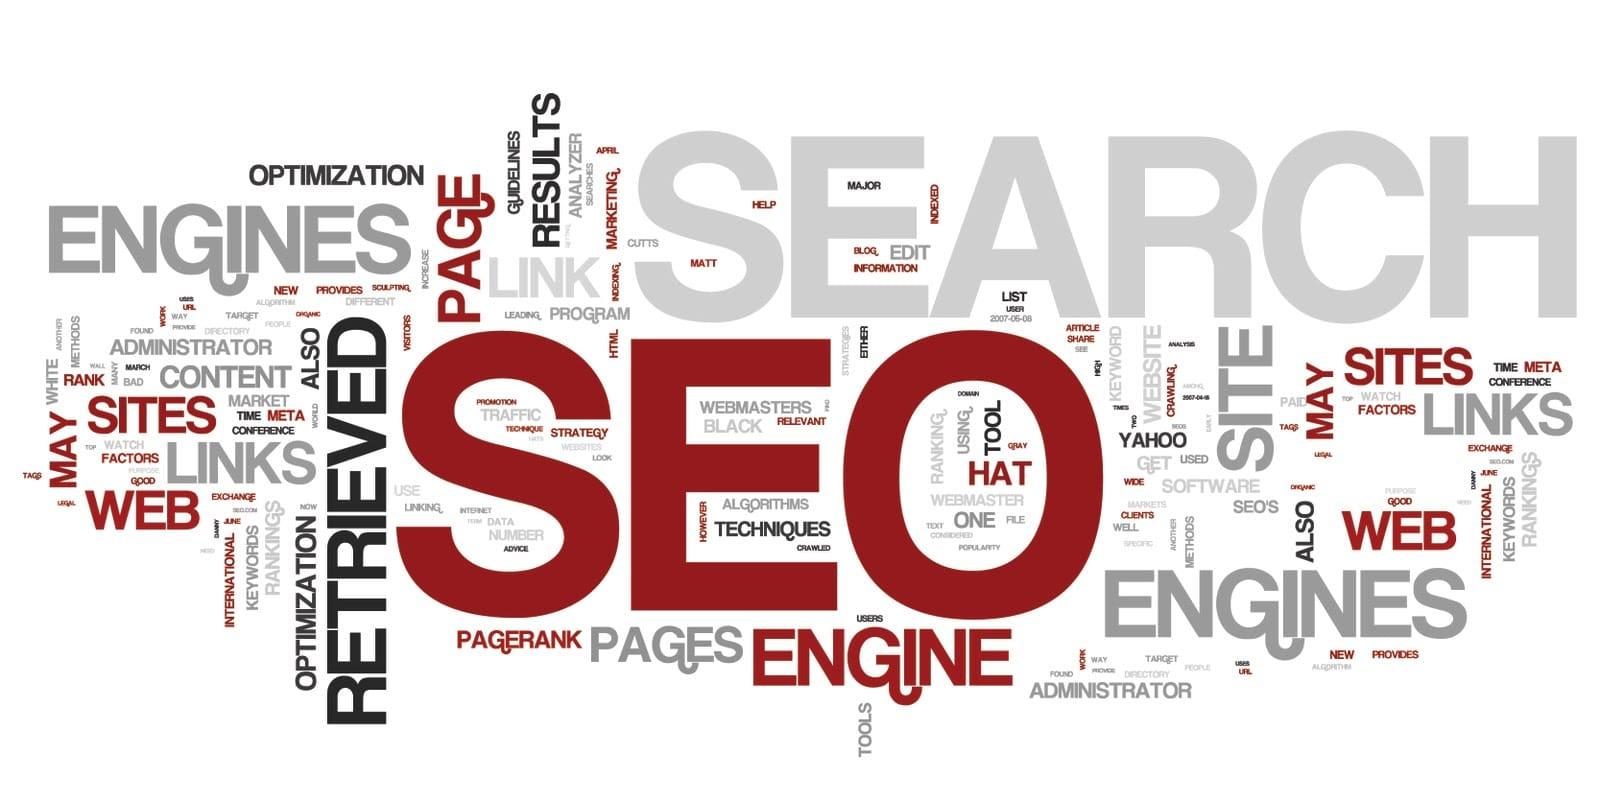 Search Marketing Lake Como